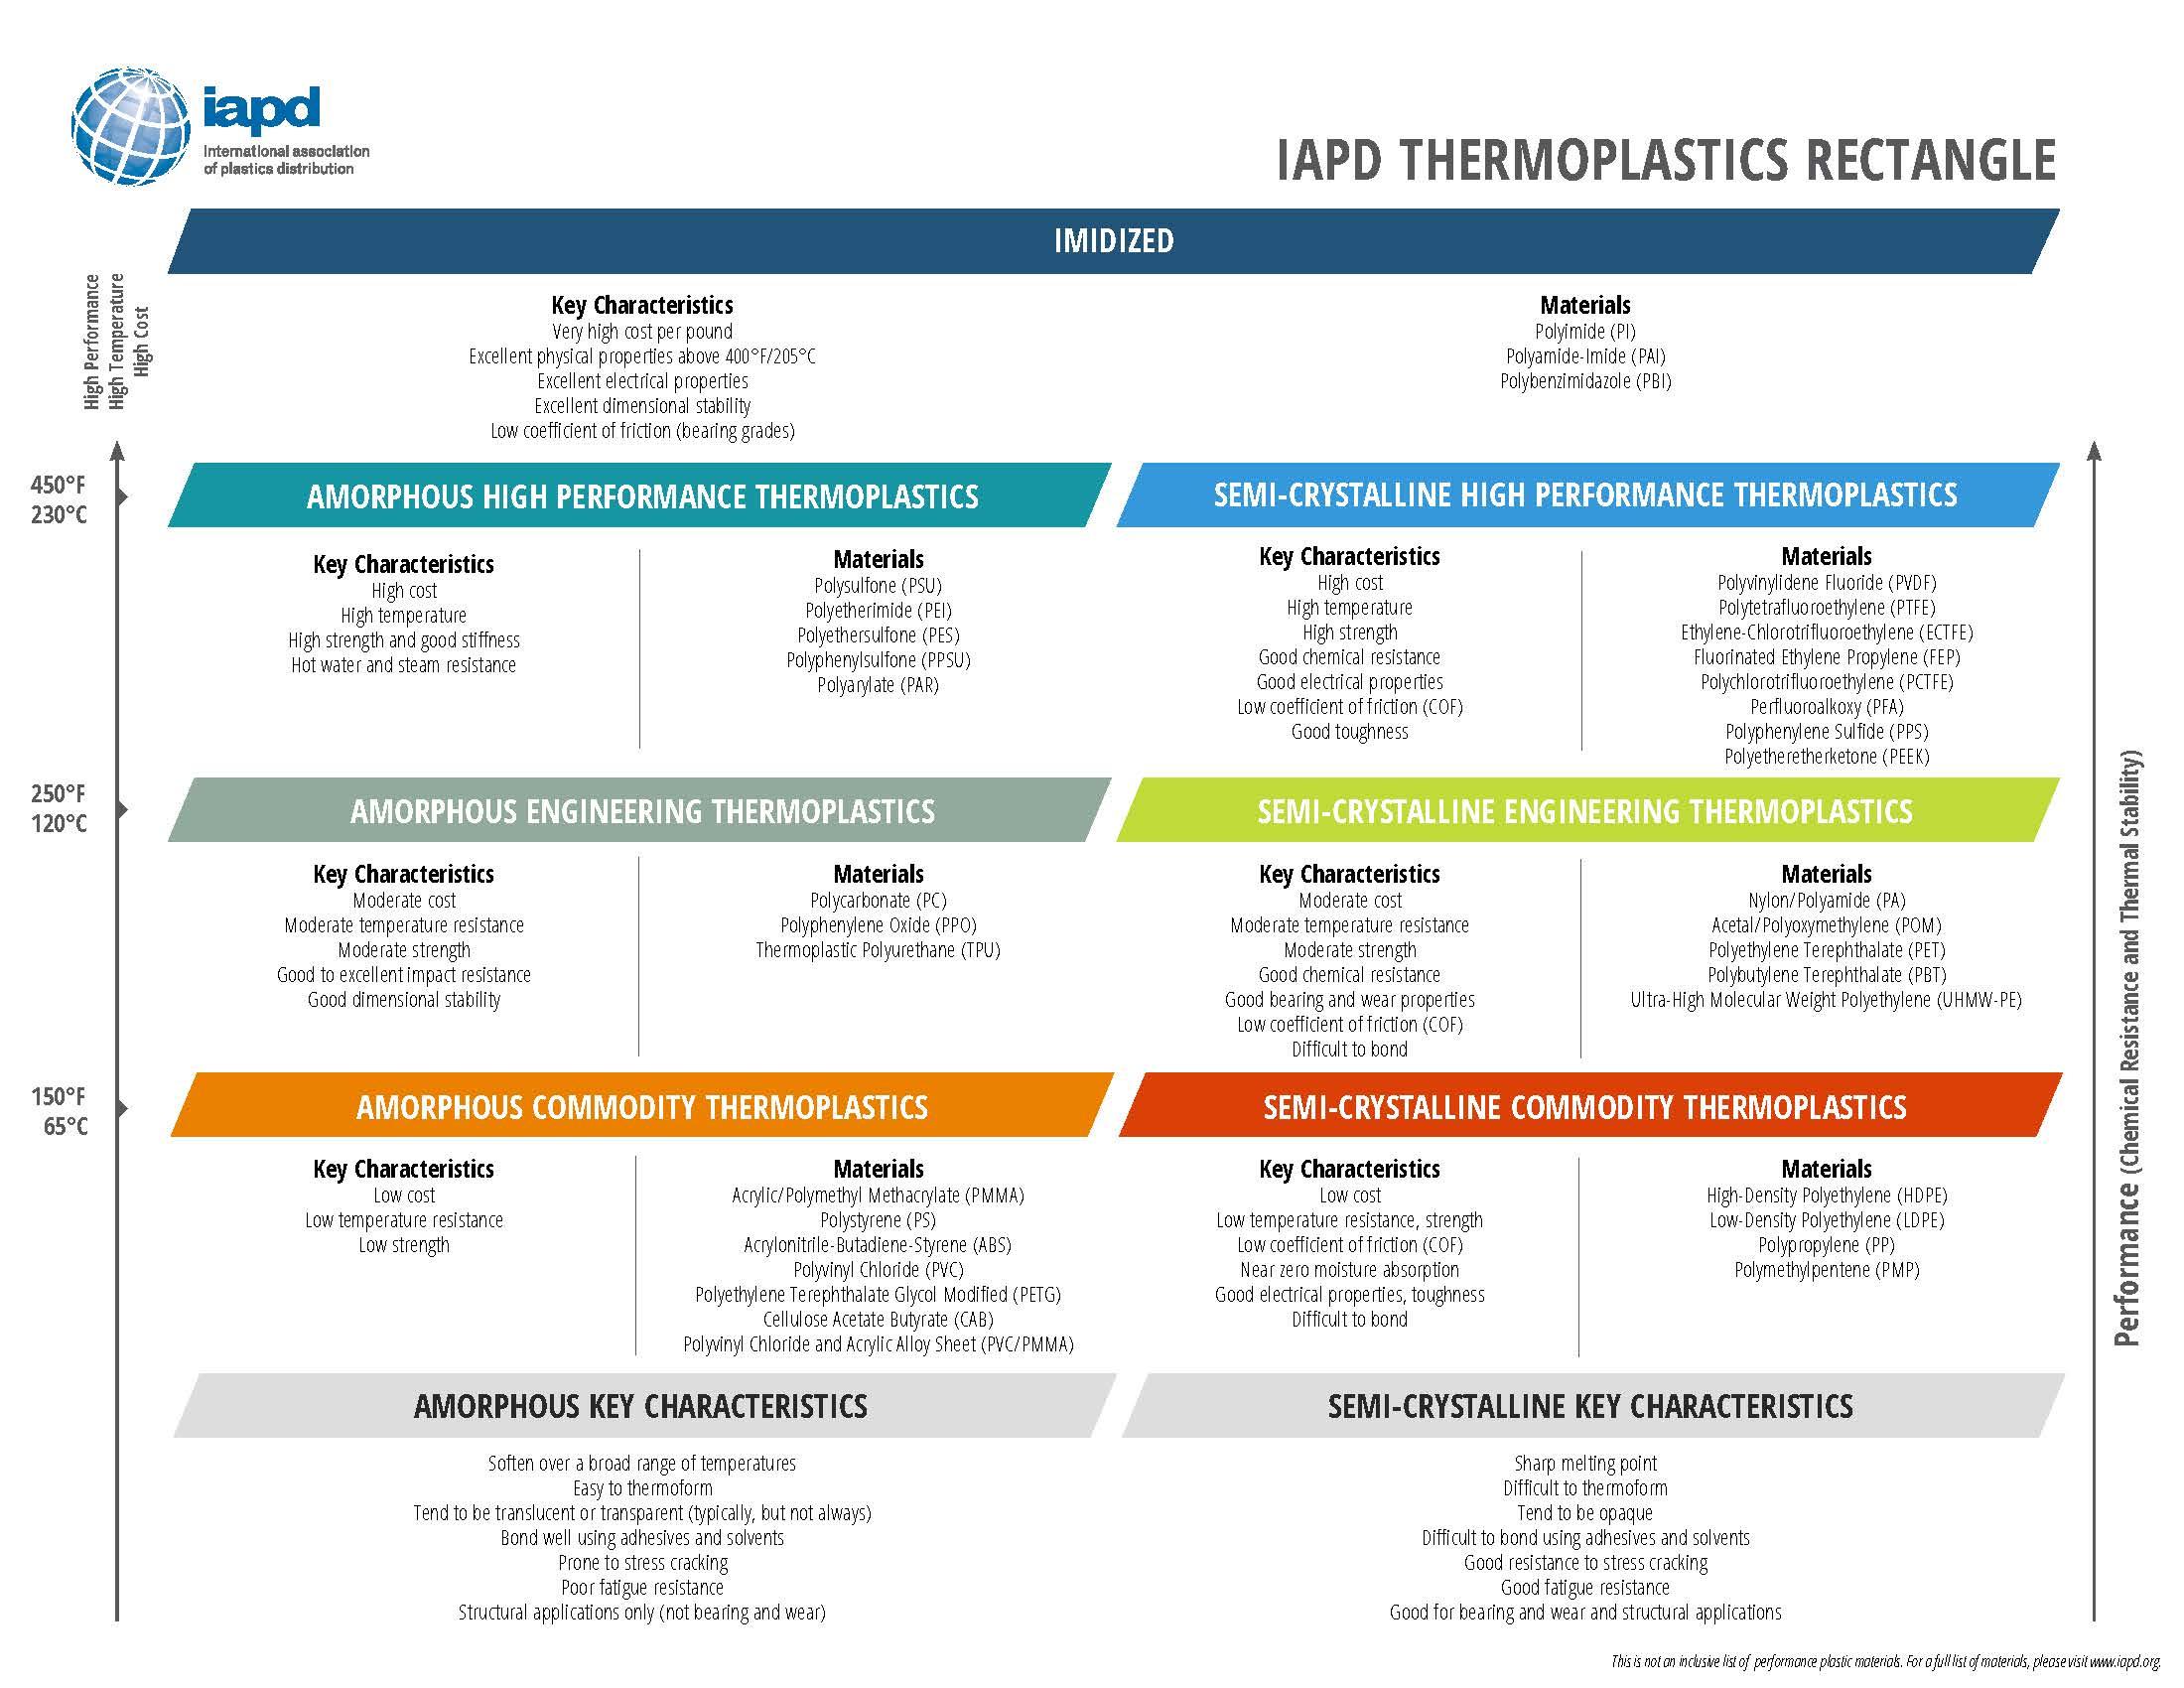 New! IAPD Thermoplastics Rectangle